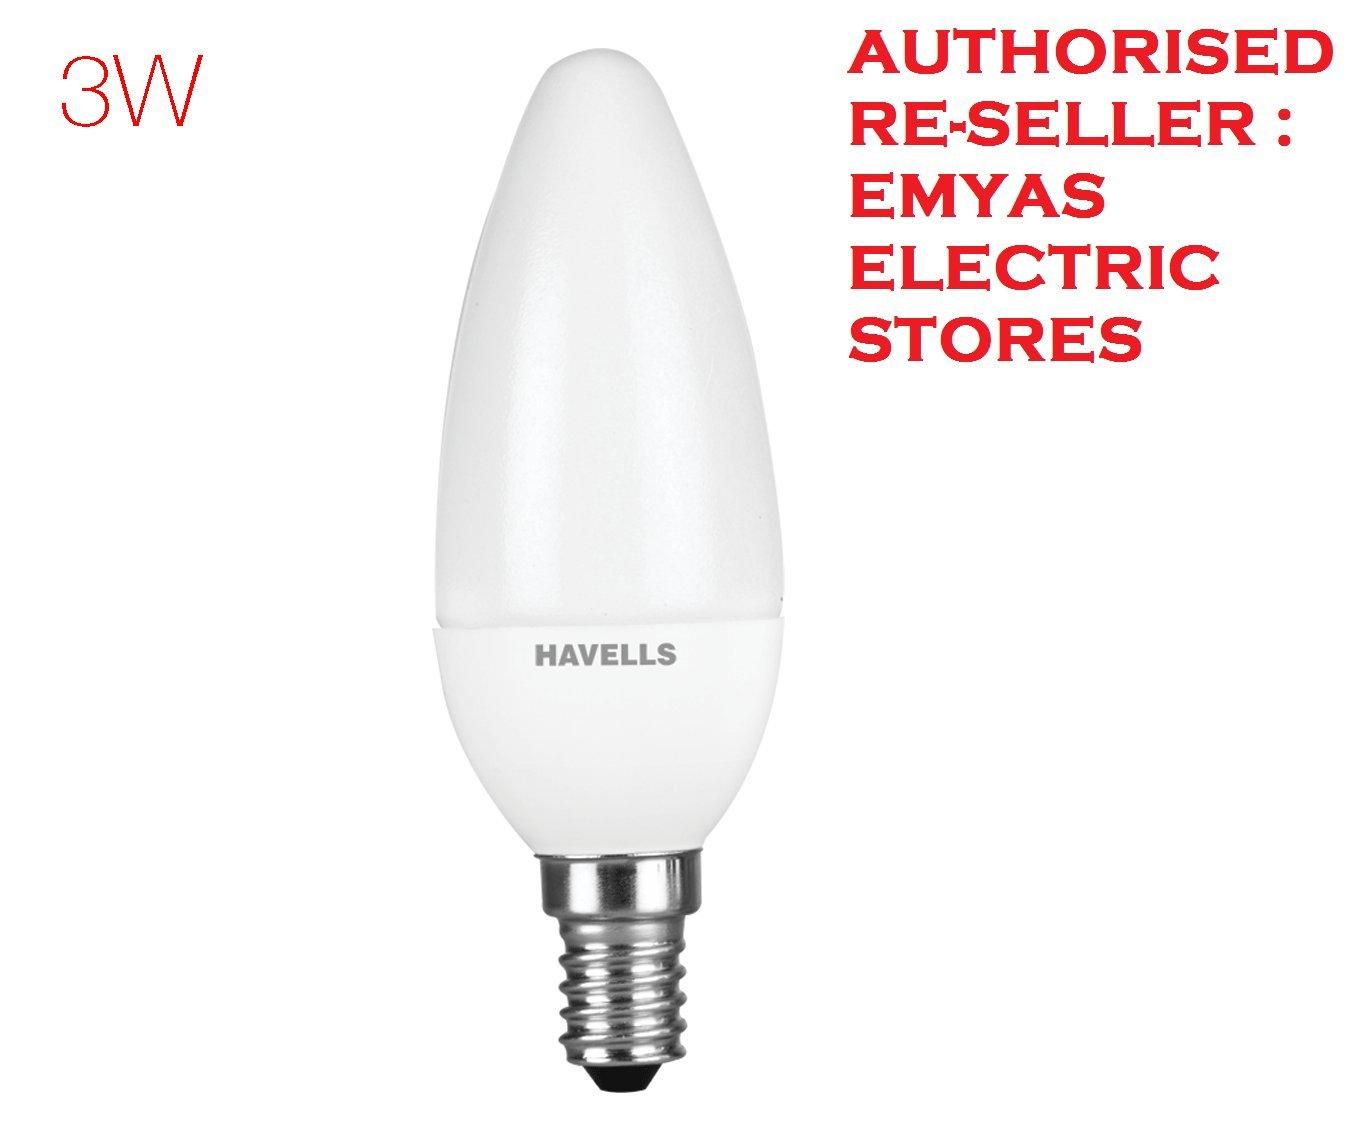 LED Lumeno 3 Watt E14 Warm White Ball Lamp